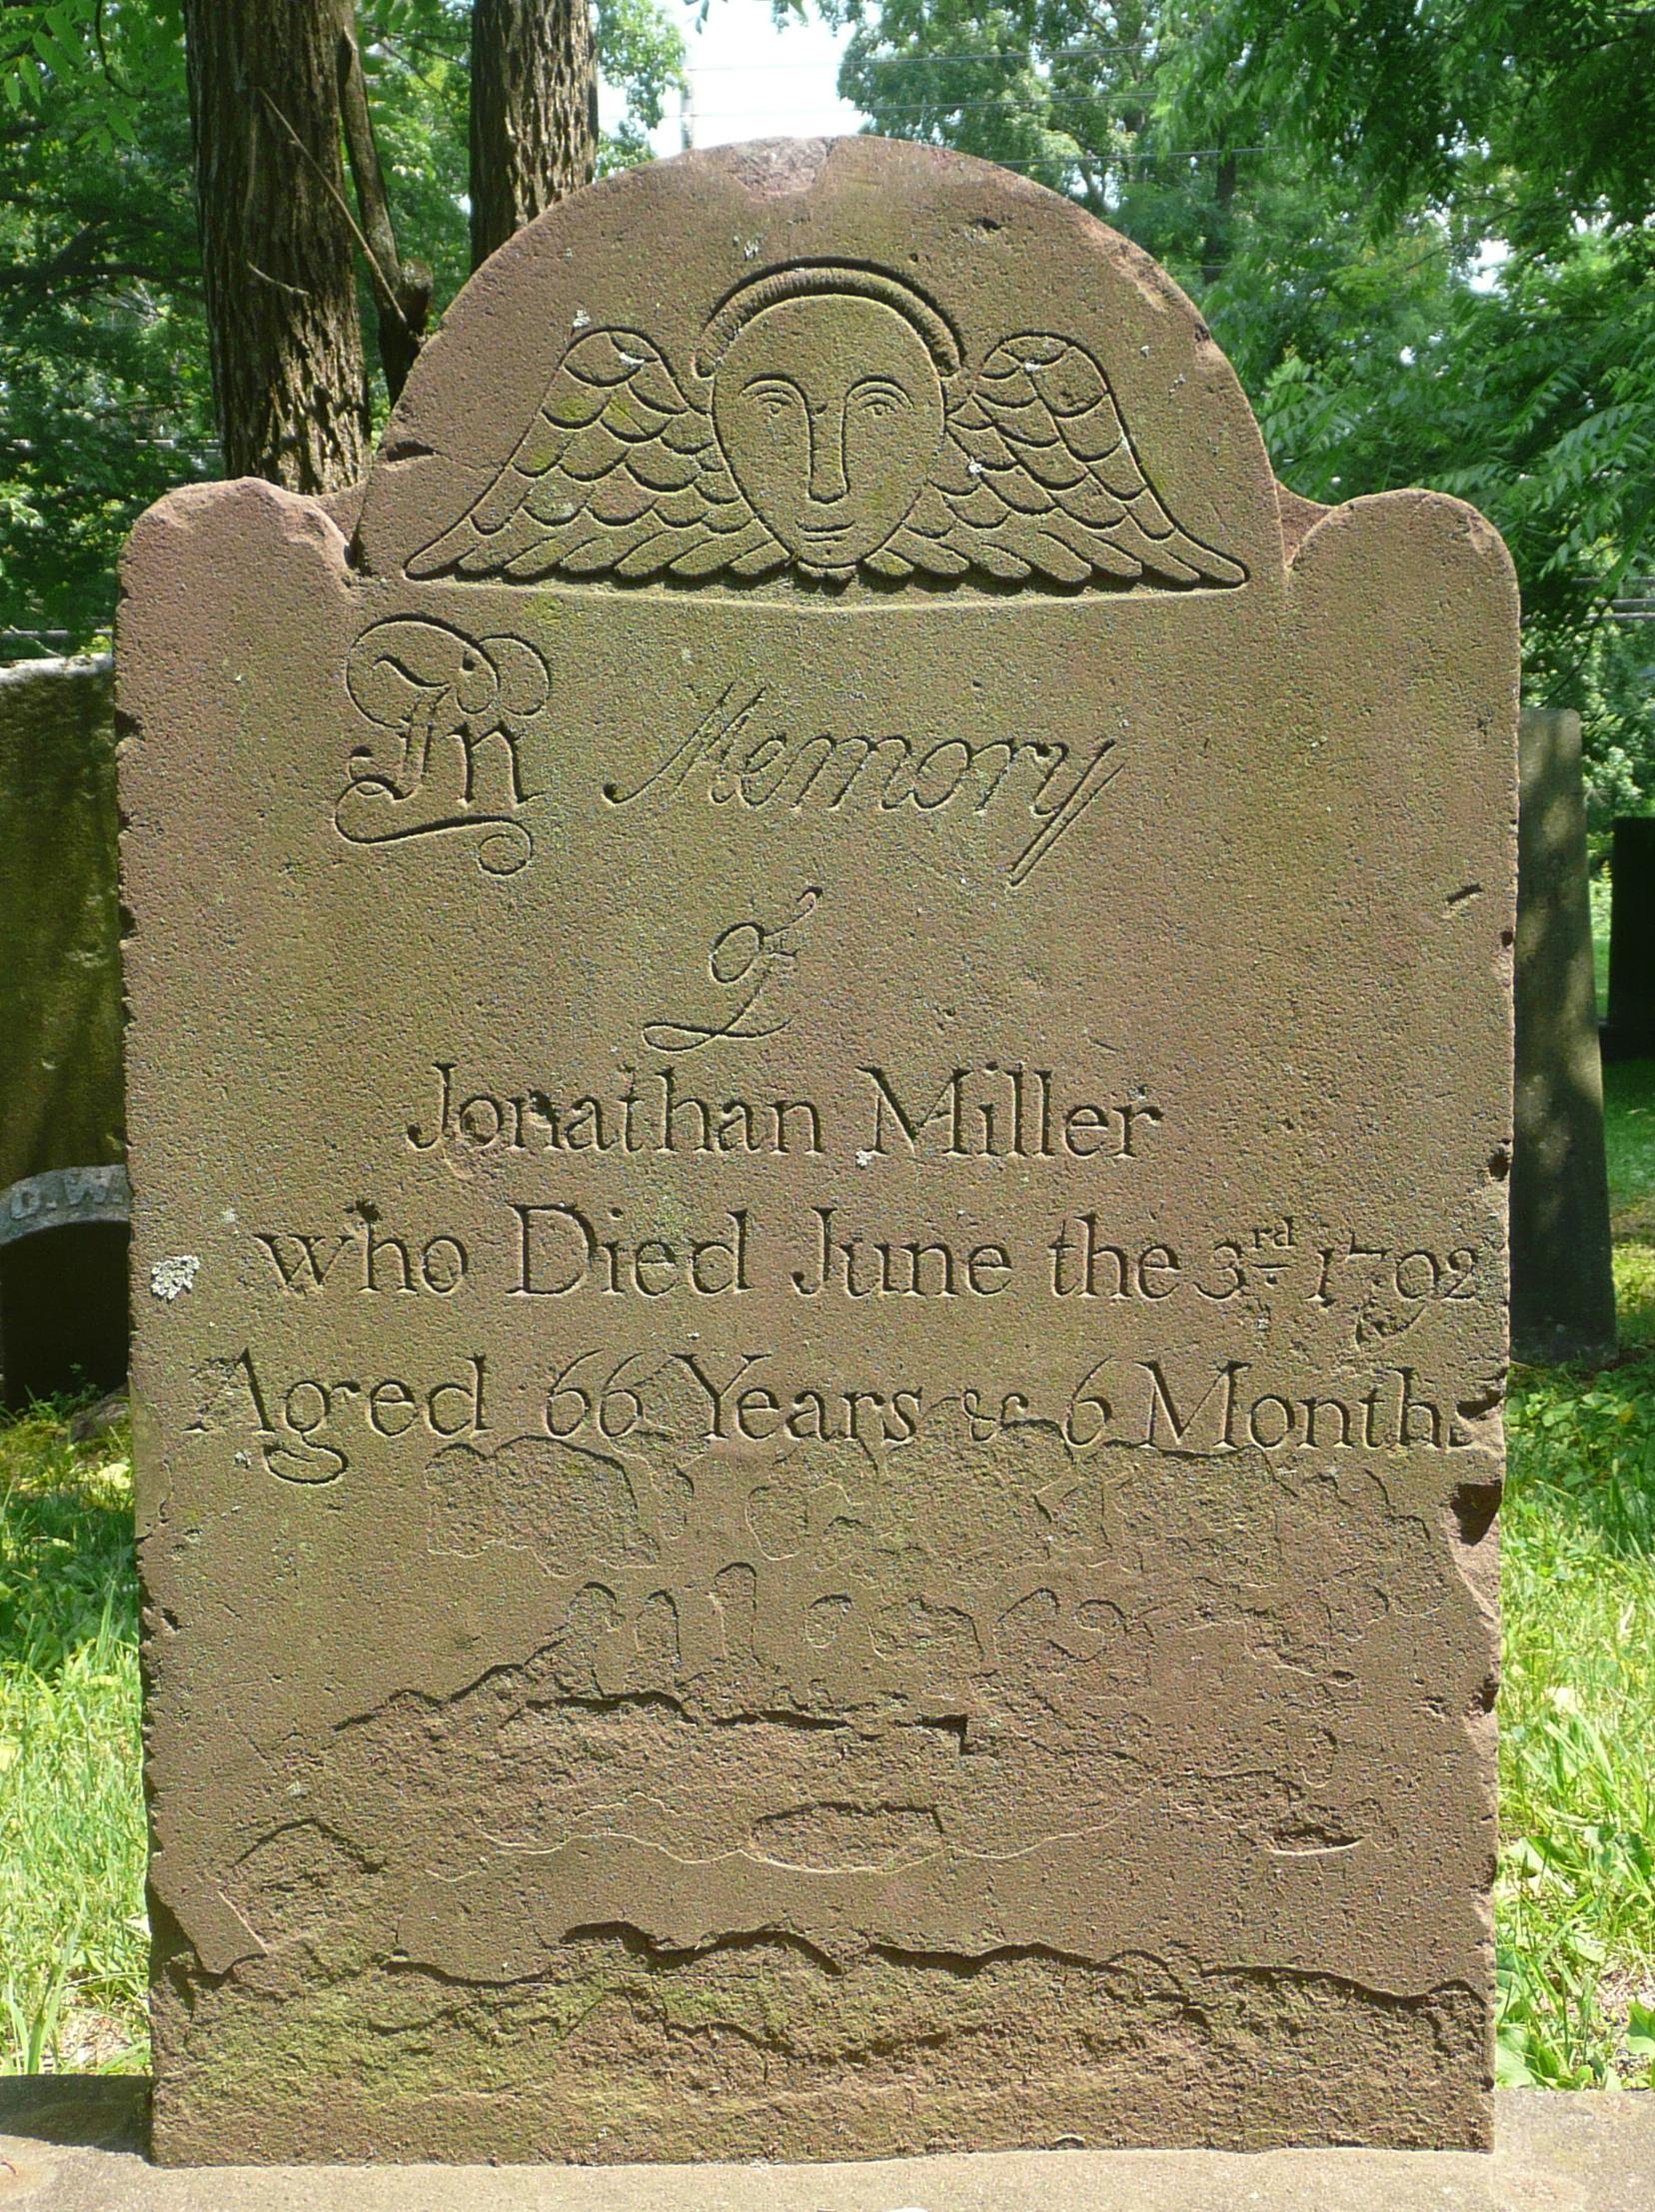 Tombstone of Jonathan Miller.